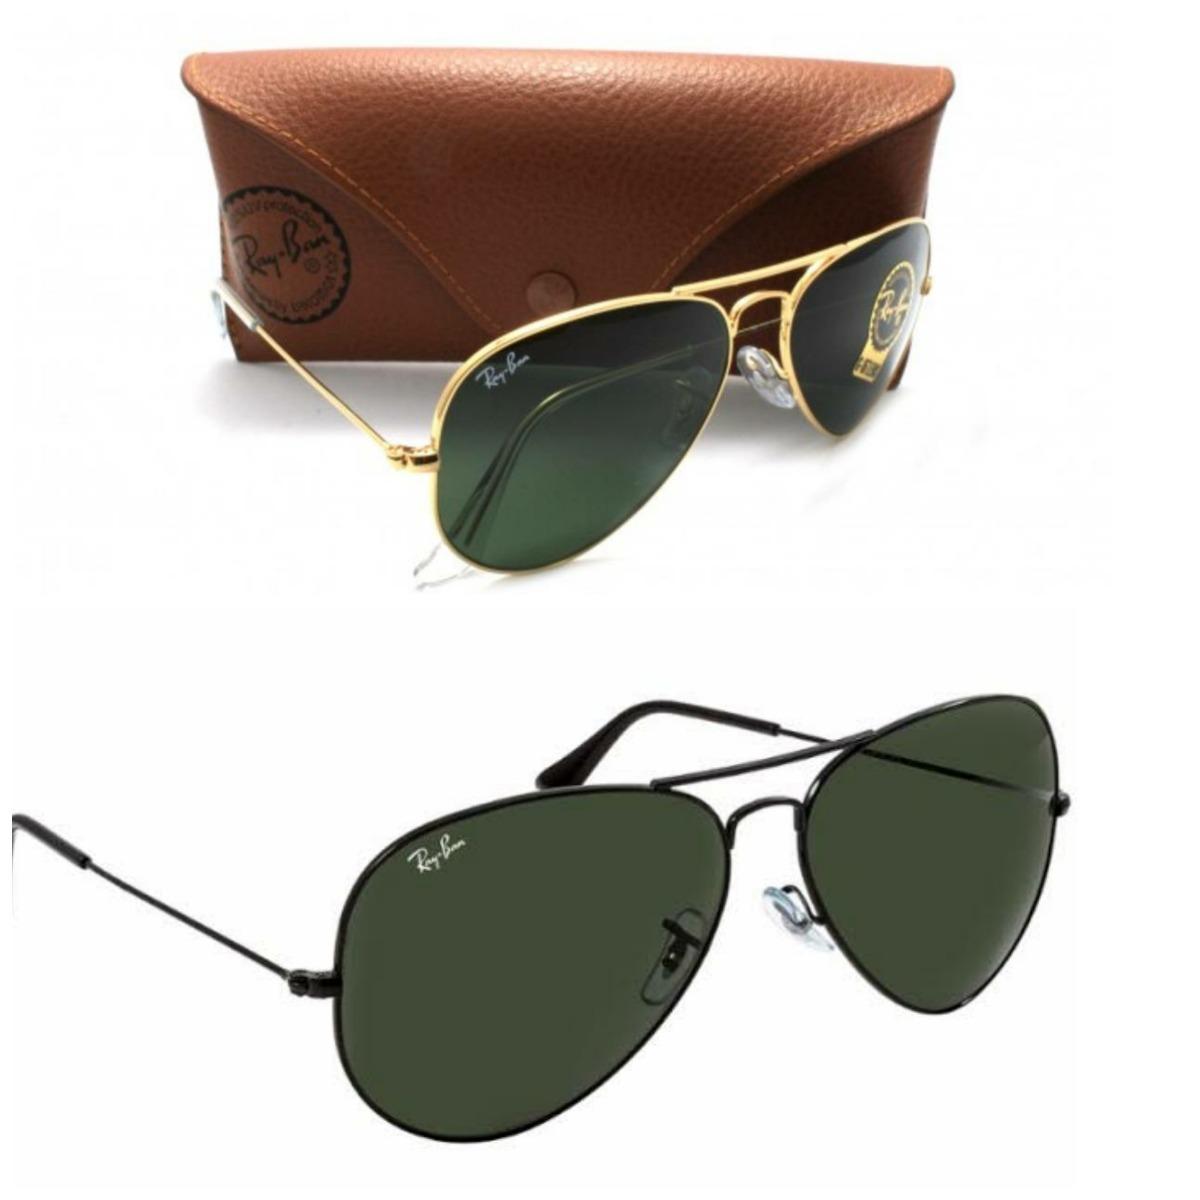 67a5ba448ee05 oculos de sol rb3025 aviador ray-ban kit masculino feminino. Carregando zoom .